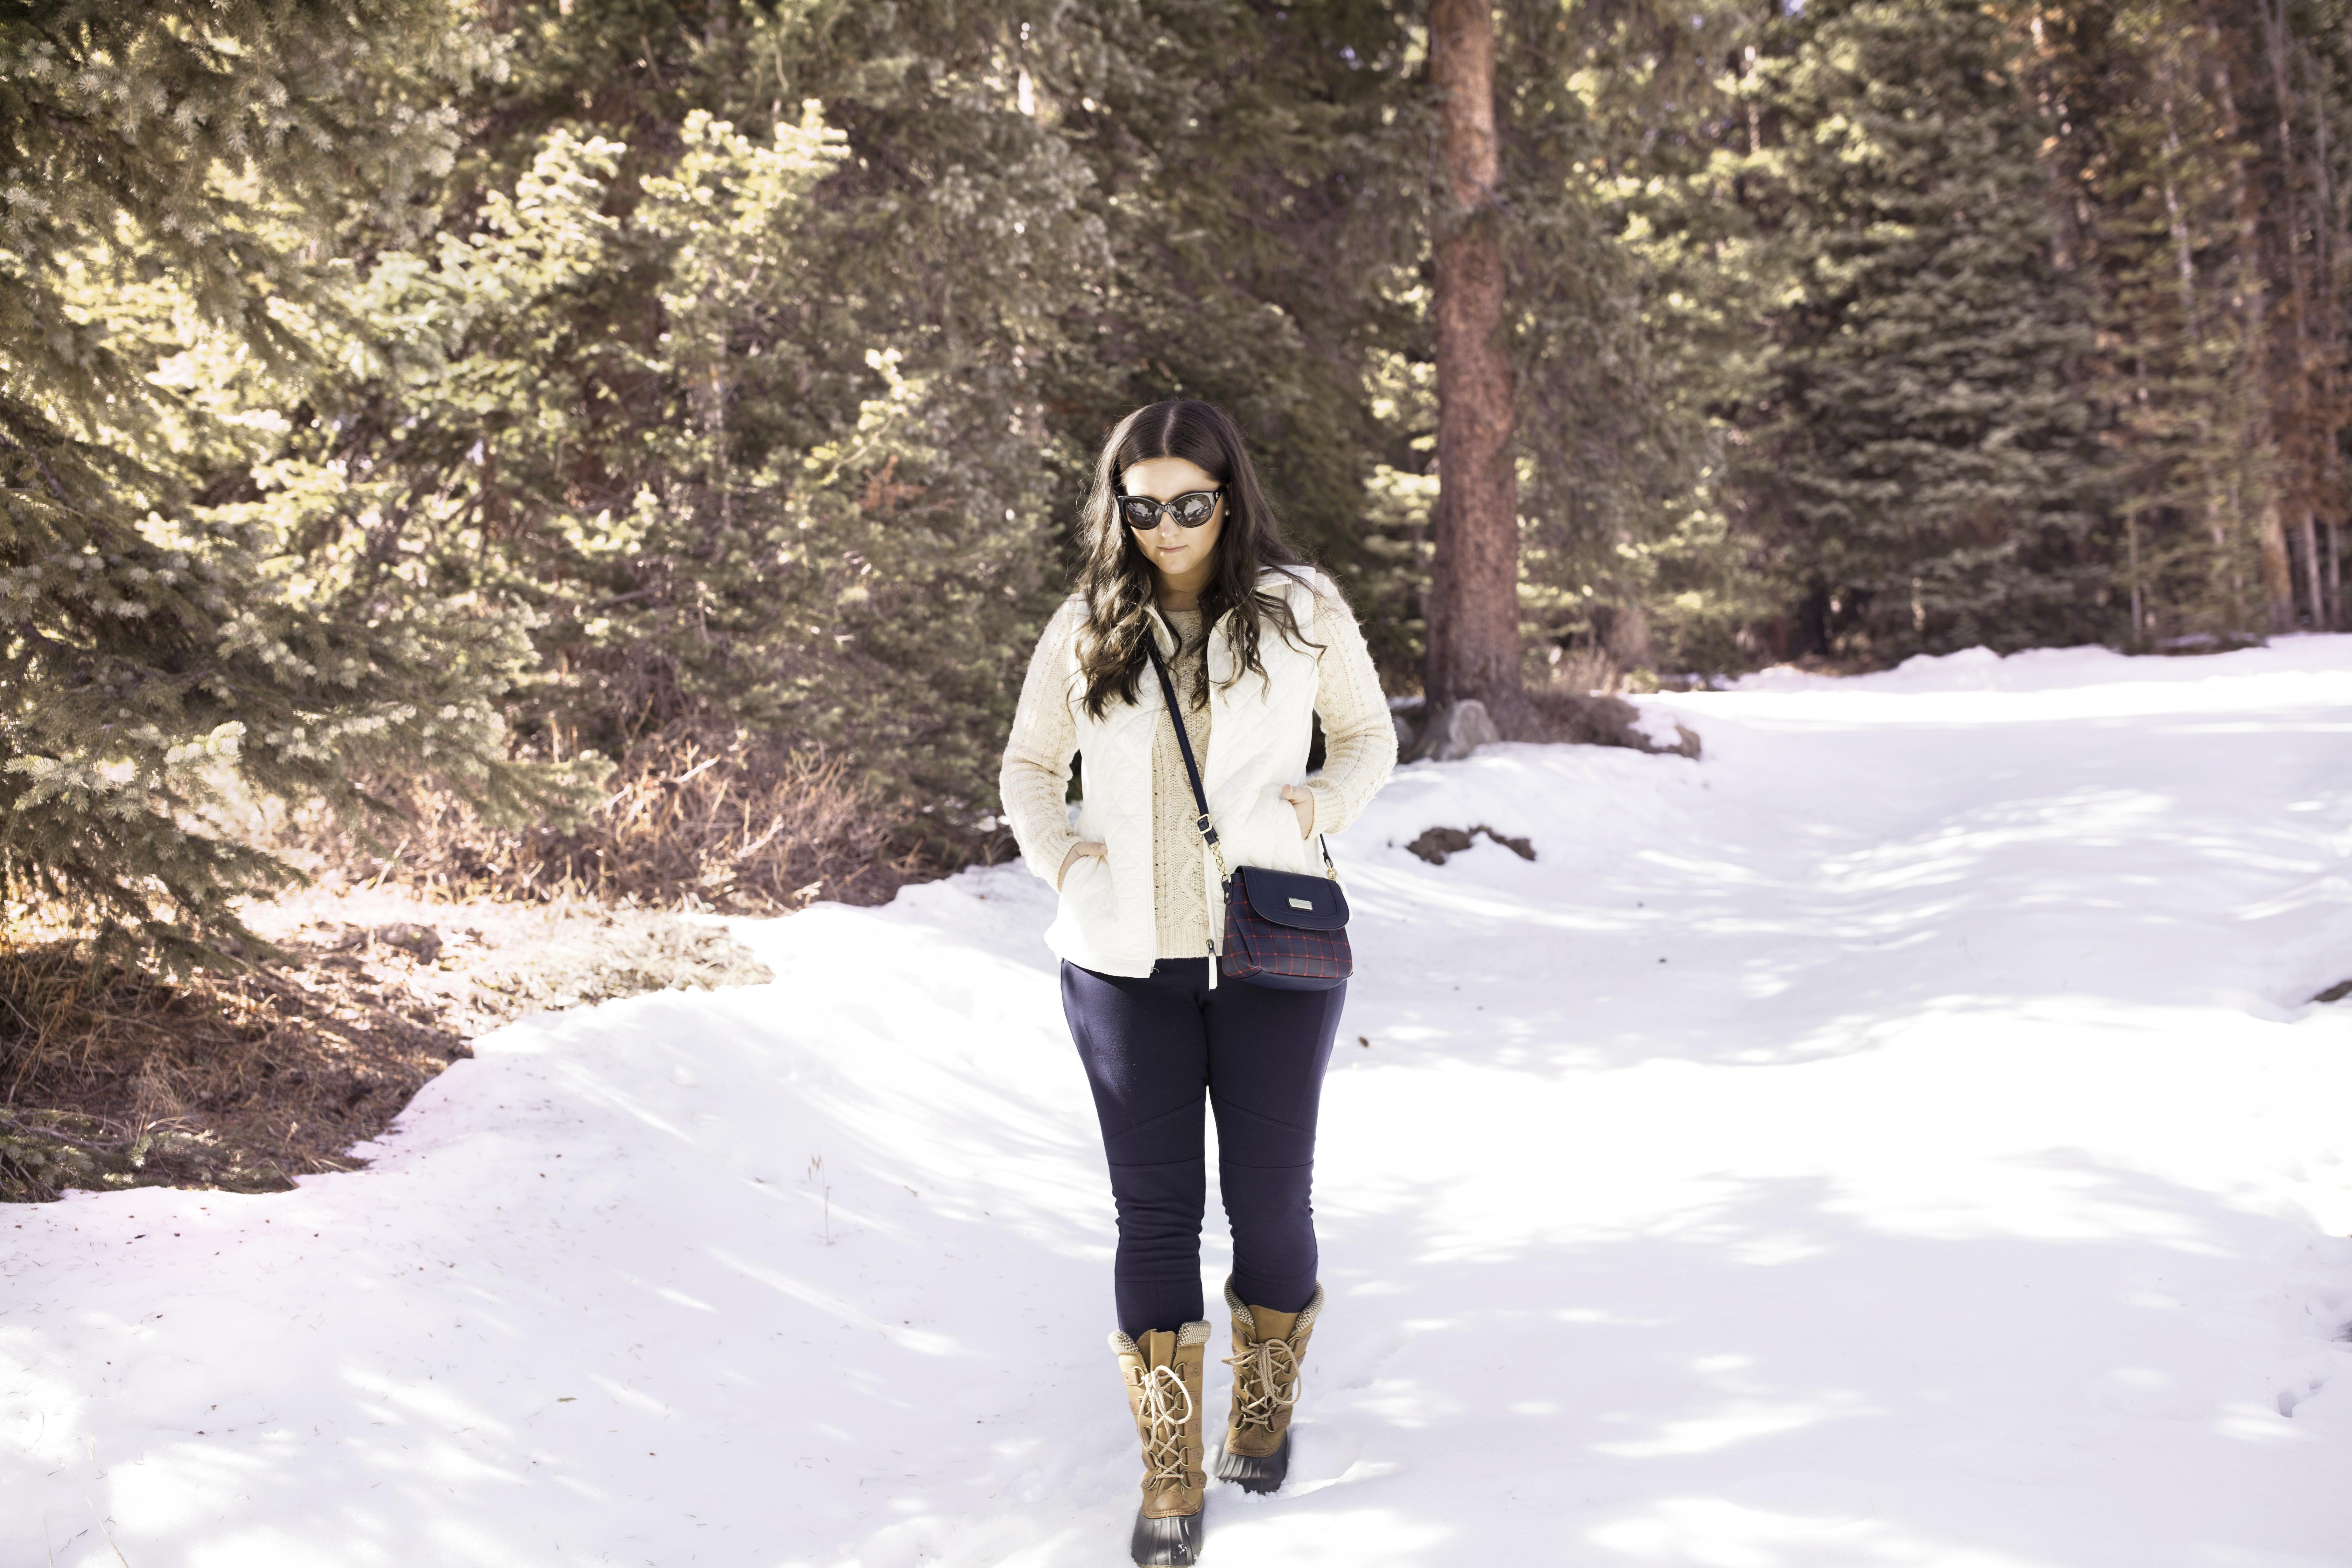 glamping trip to Breckenridge Colorado, glamping hub vacation